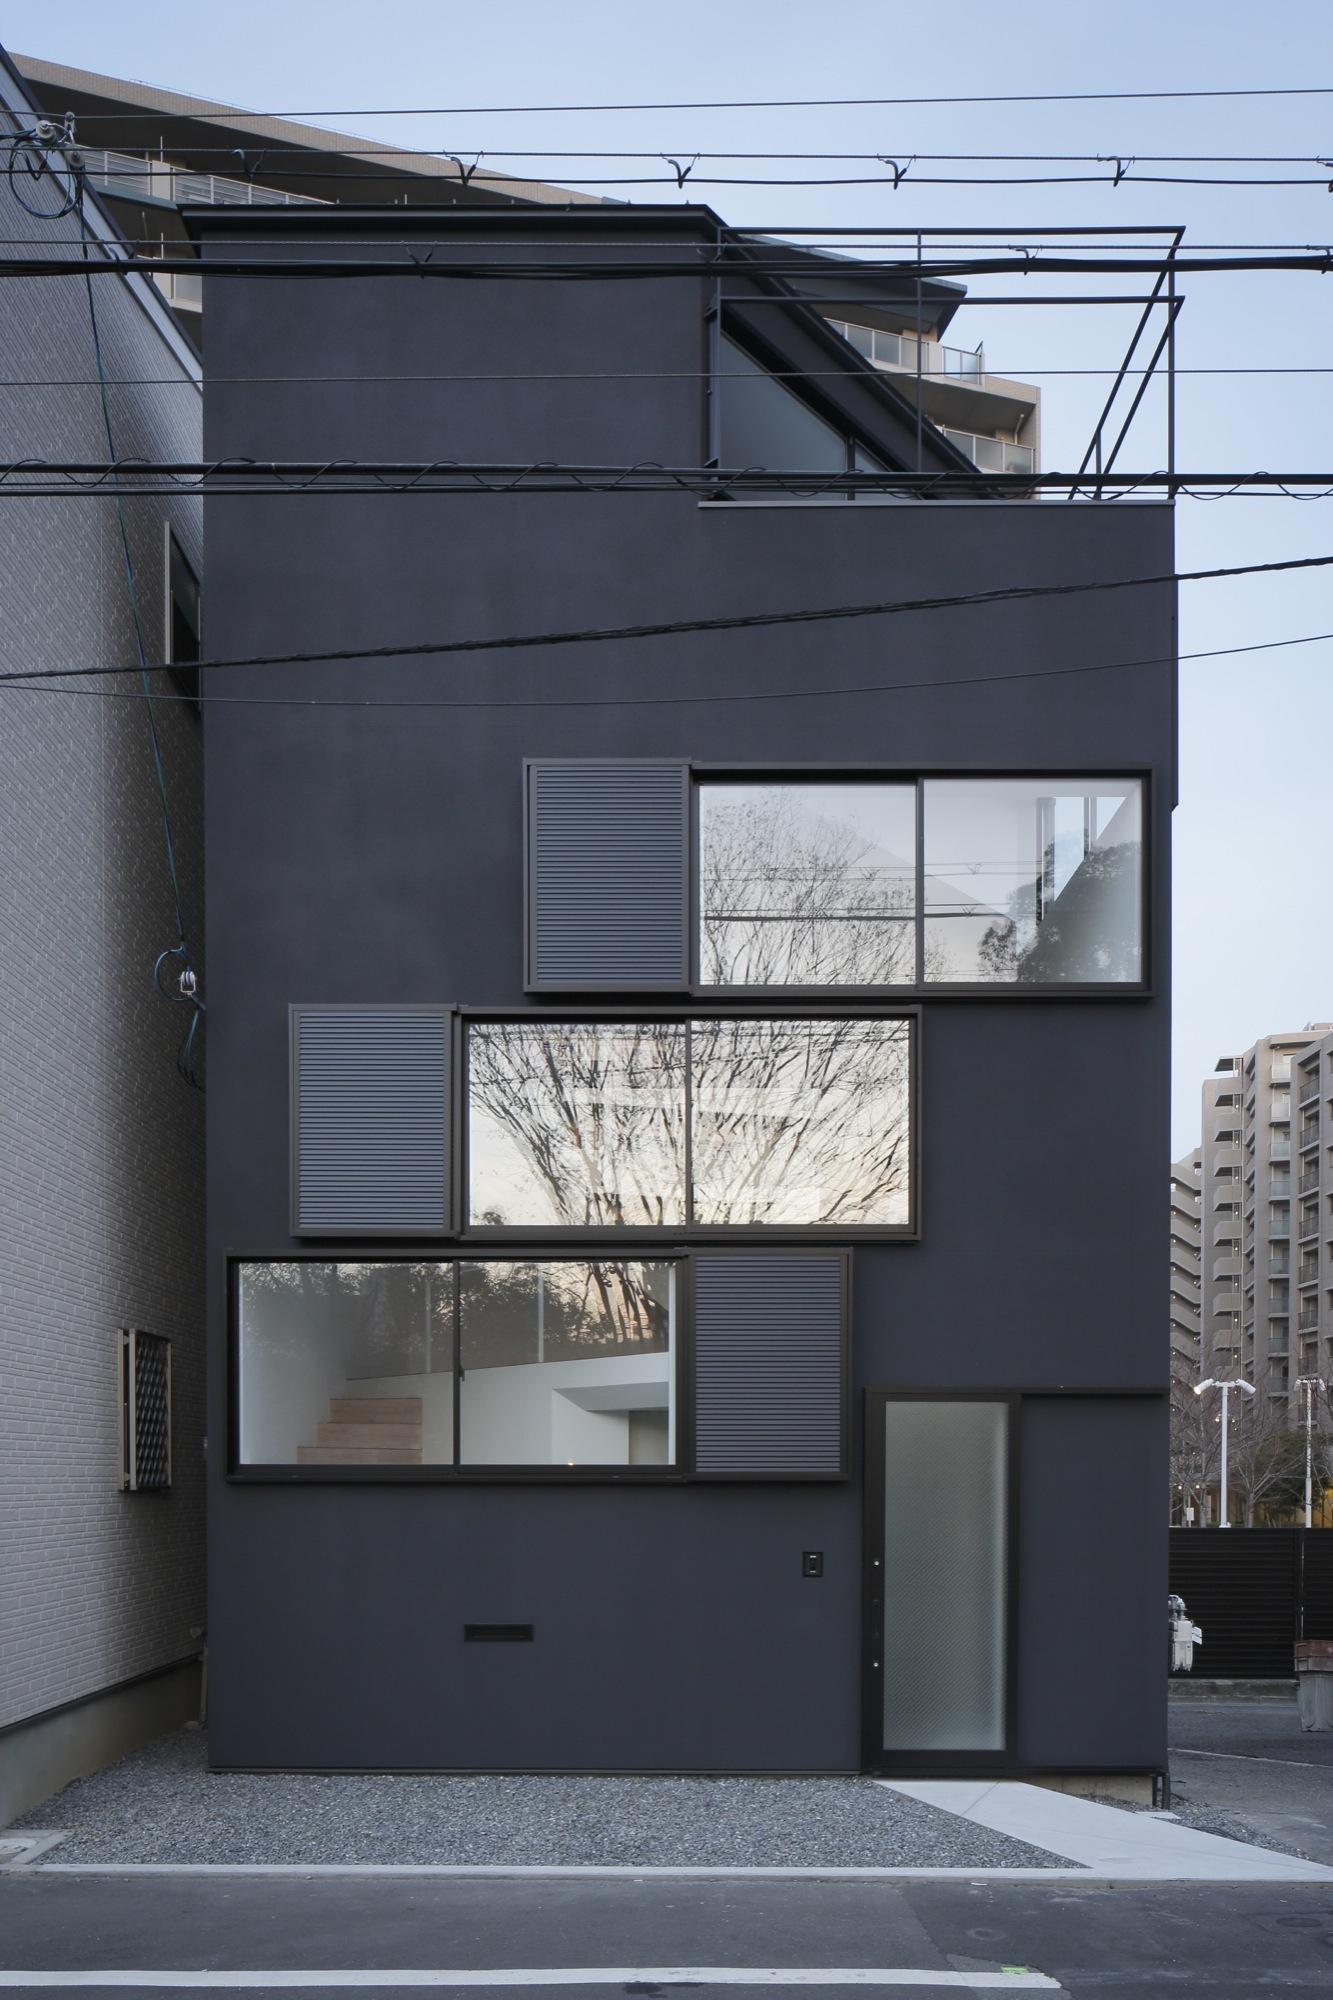 Long Horizontal Windows Houses